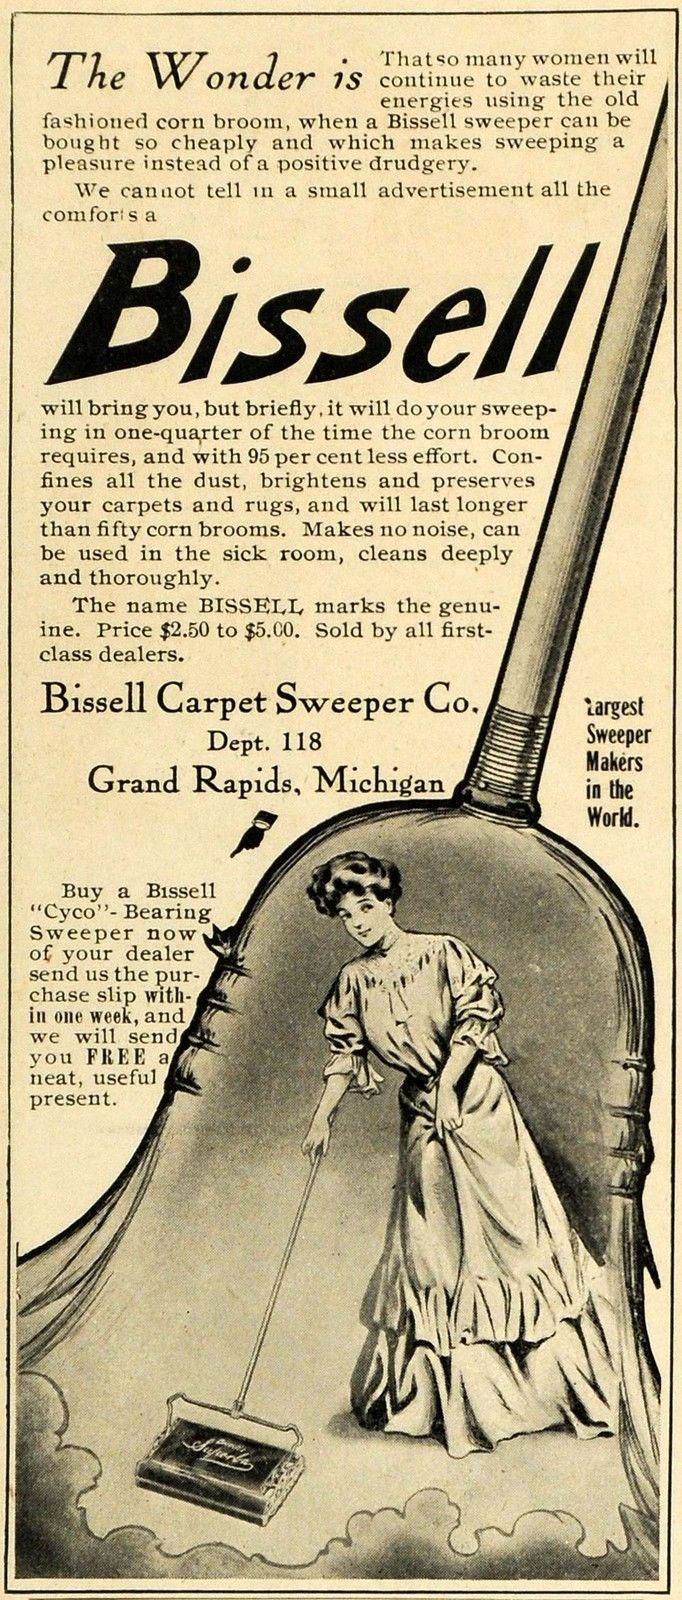 162 Best Grand Rapids 1900s Images On Pinterest